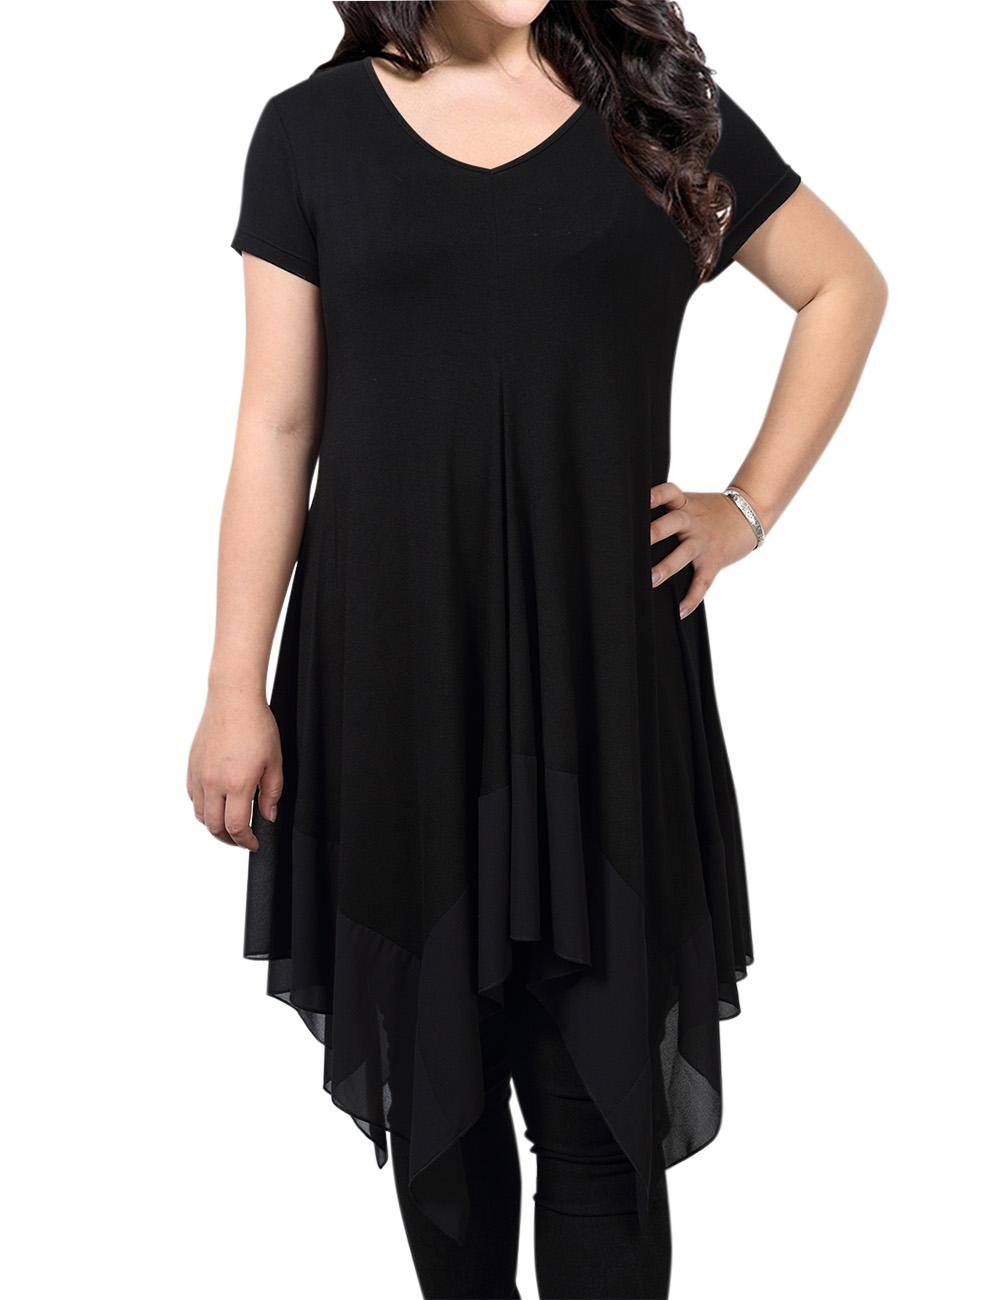 [EU Direct] AMZ PLUS Women Short Sleeve Spliced Asymmetrical Plus Size Tunic Top